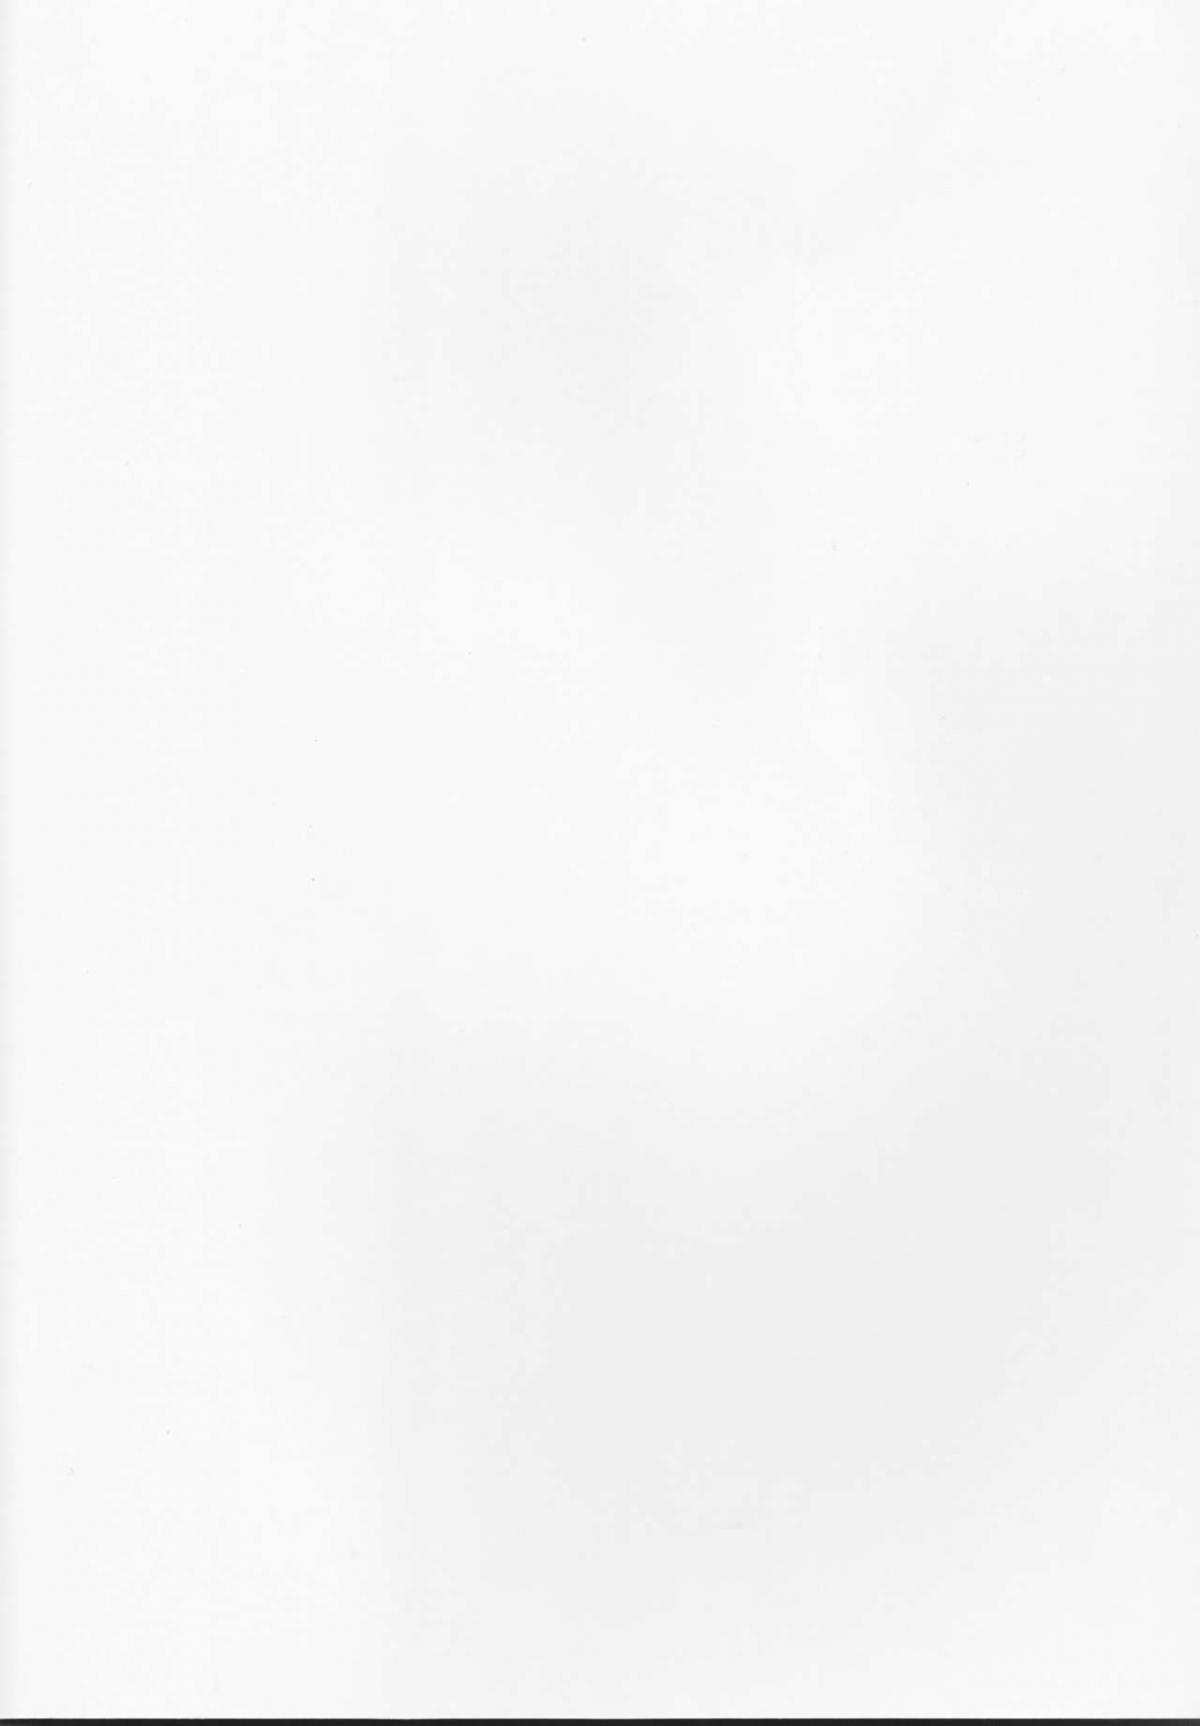 HentaiVN.net - Ảnh 3 - Yurari Oboreru Temptation (Collar x Malice) - Oneshot